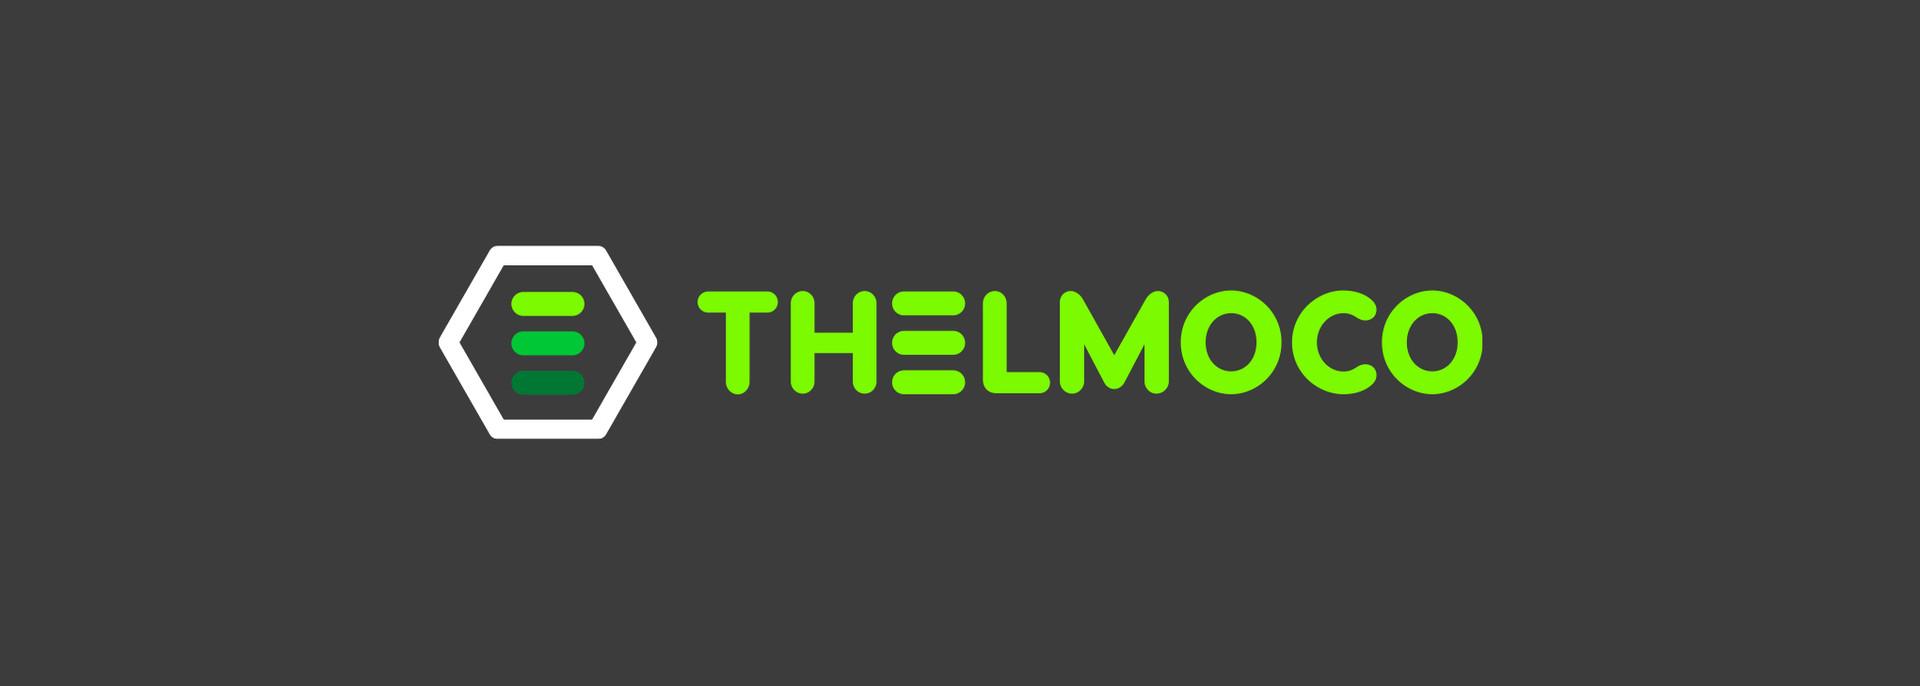 Thelmoco Branding ID.jpg